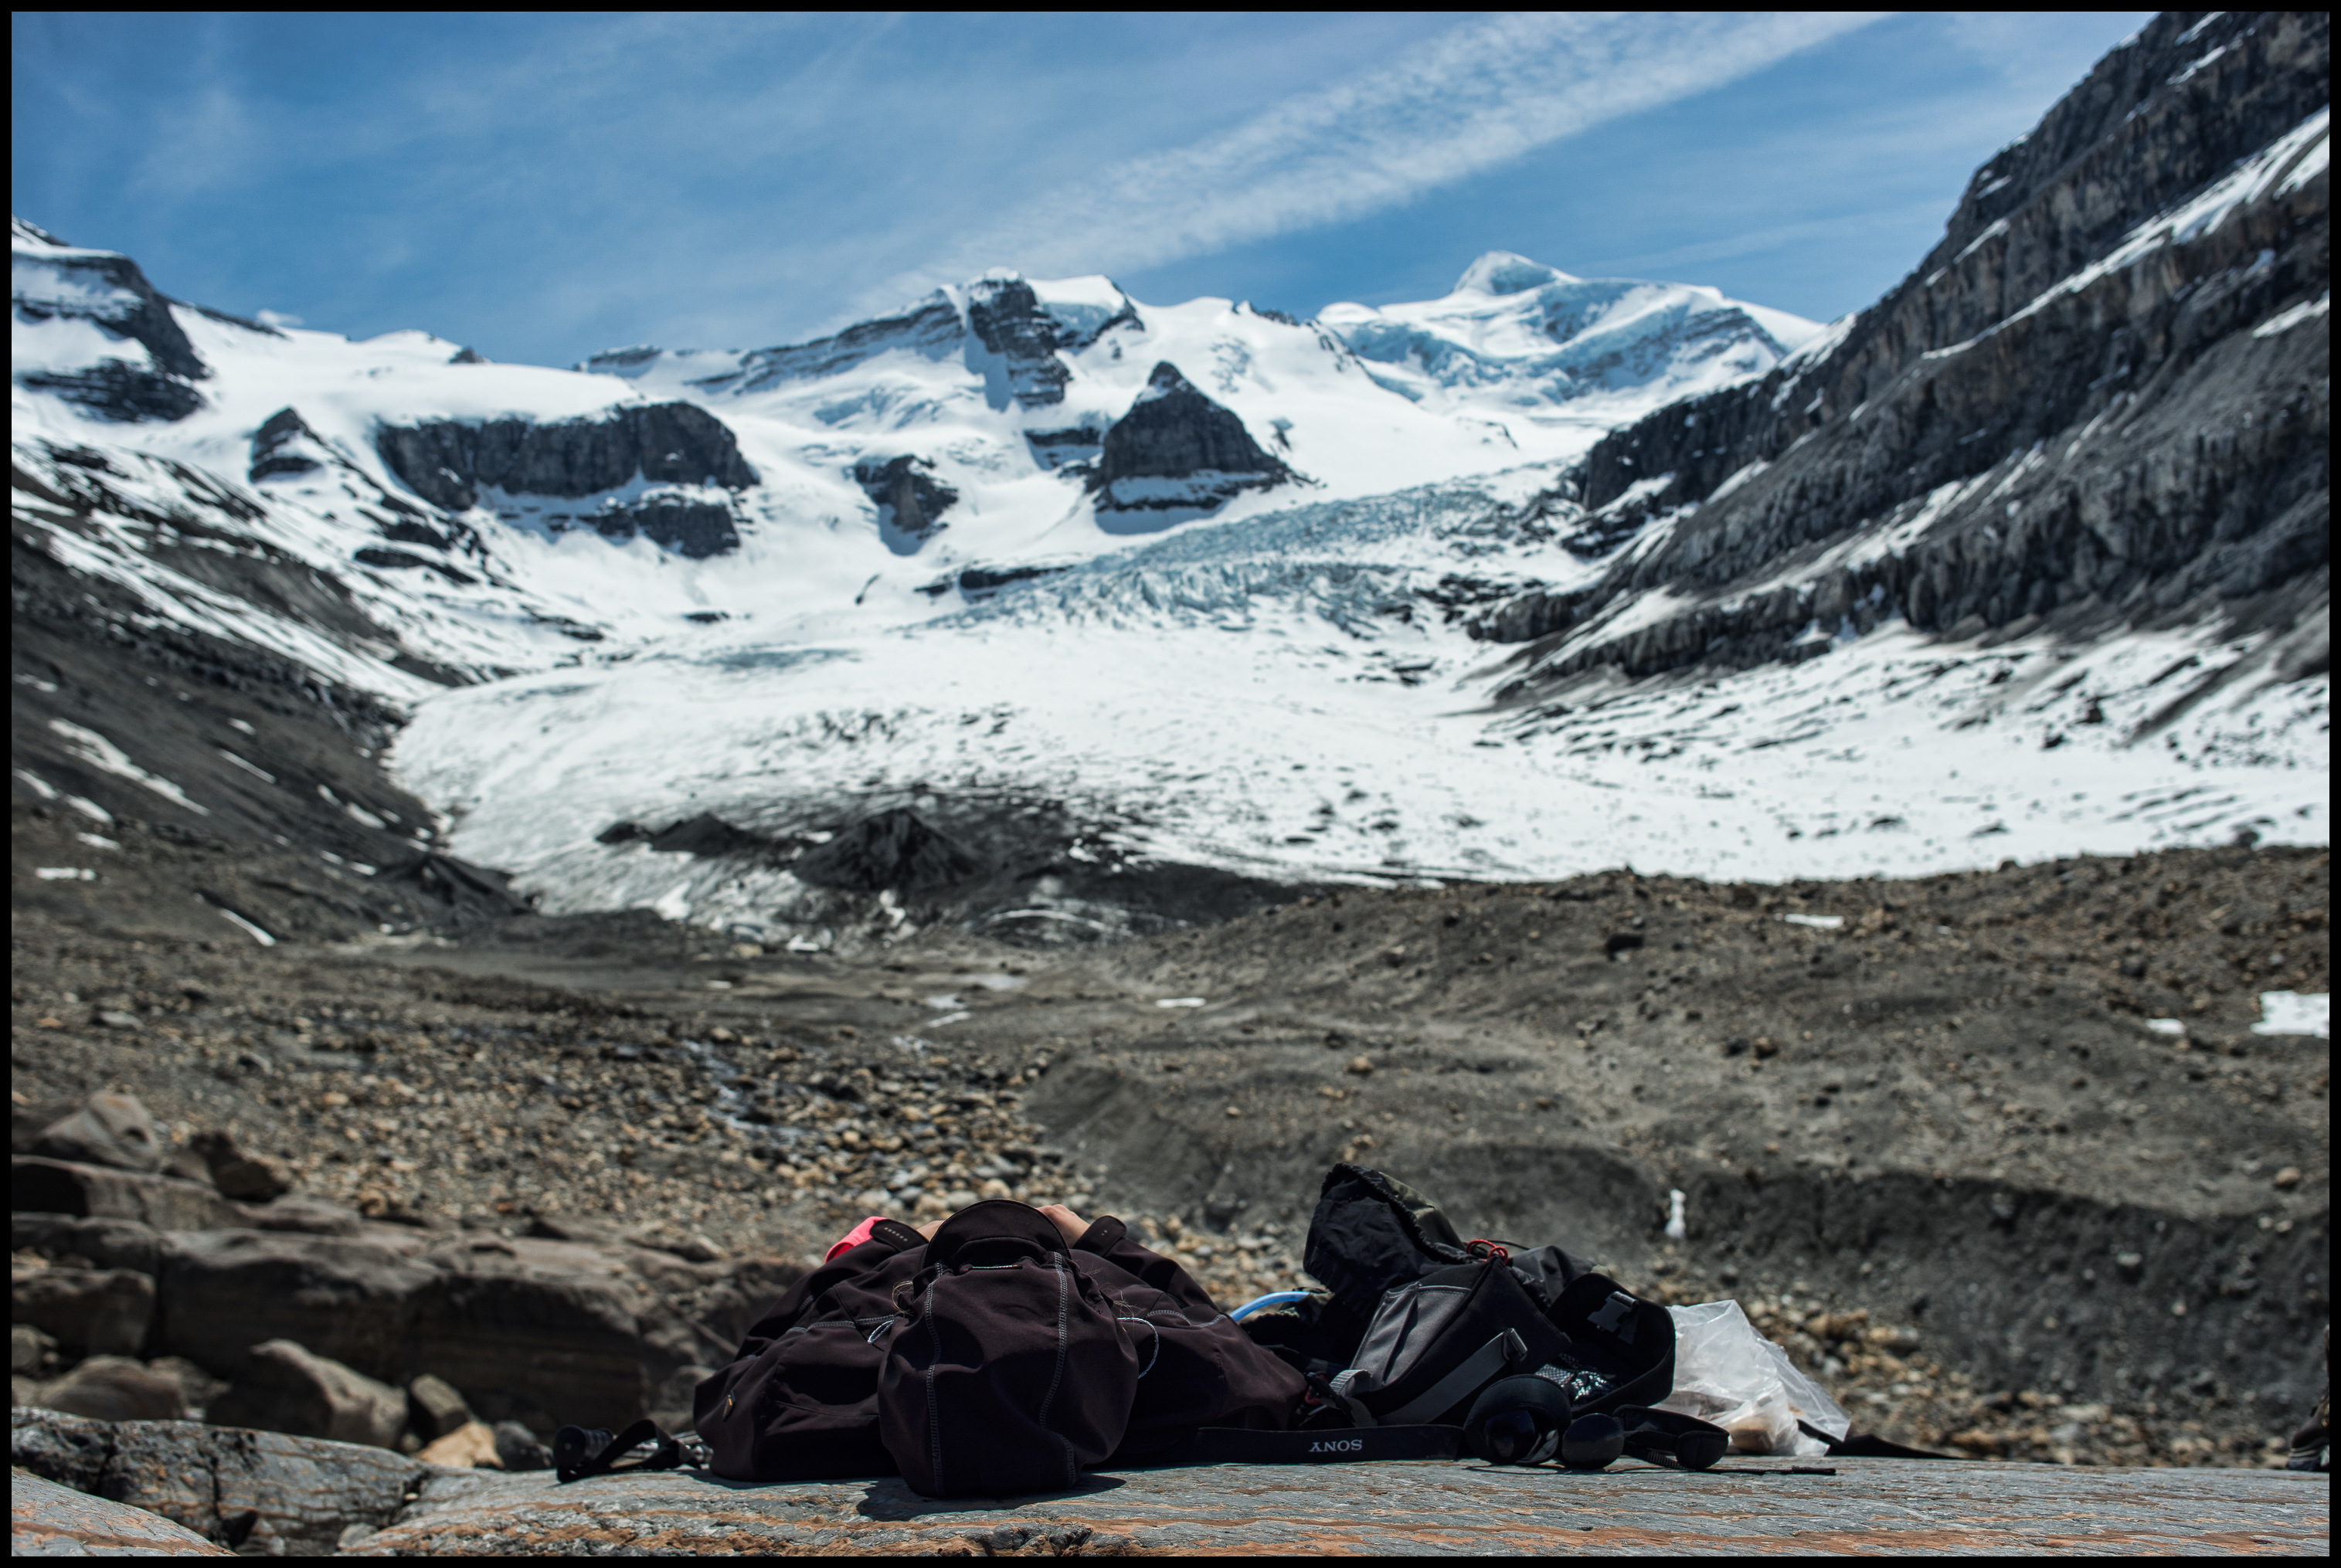 Taking a nap at the foot of Robson glacier, Berg Lake Sony A7 / Canon FD Tilt Shift 35 2.8